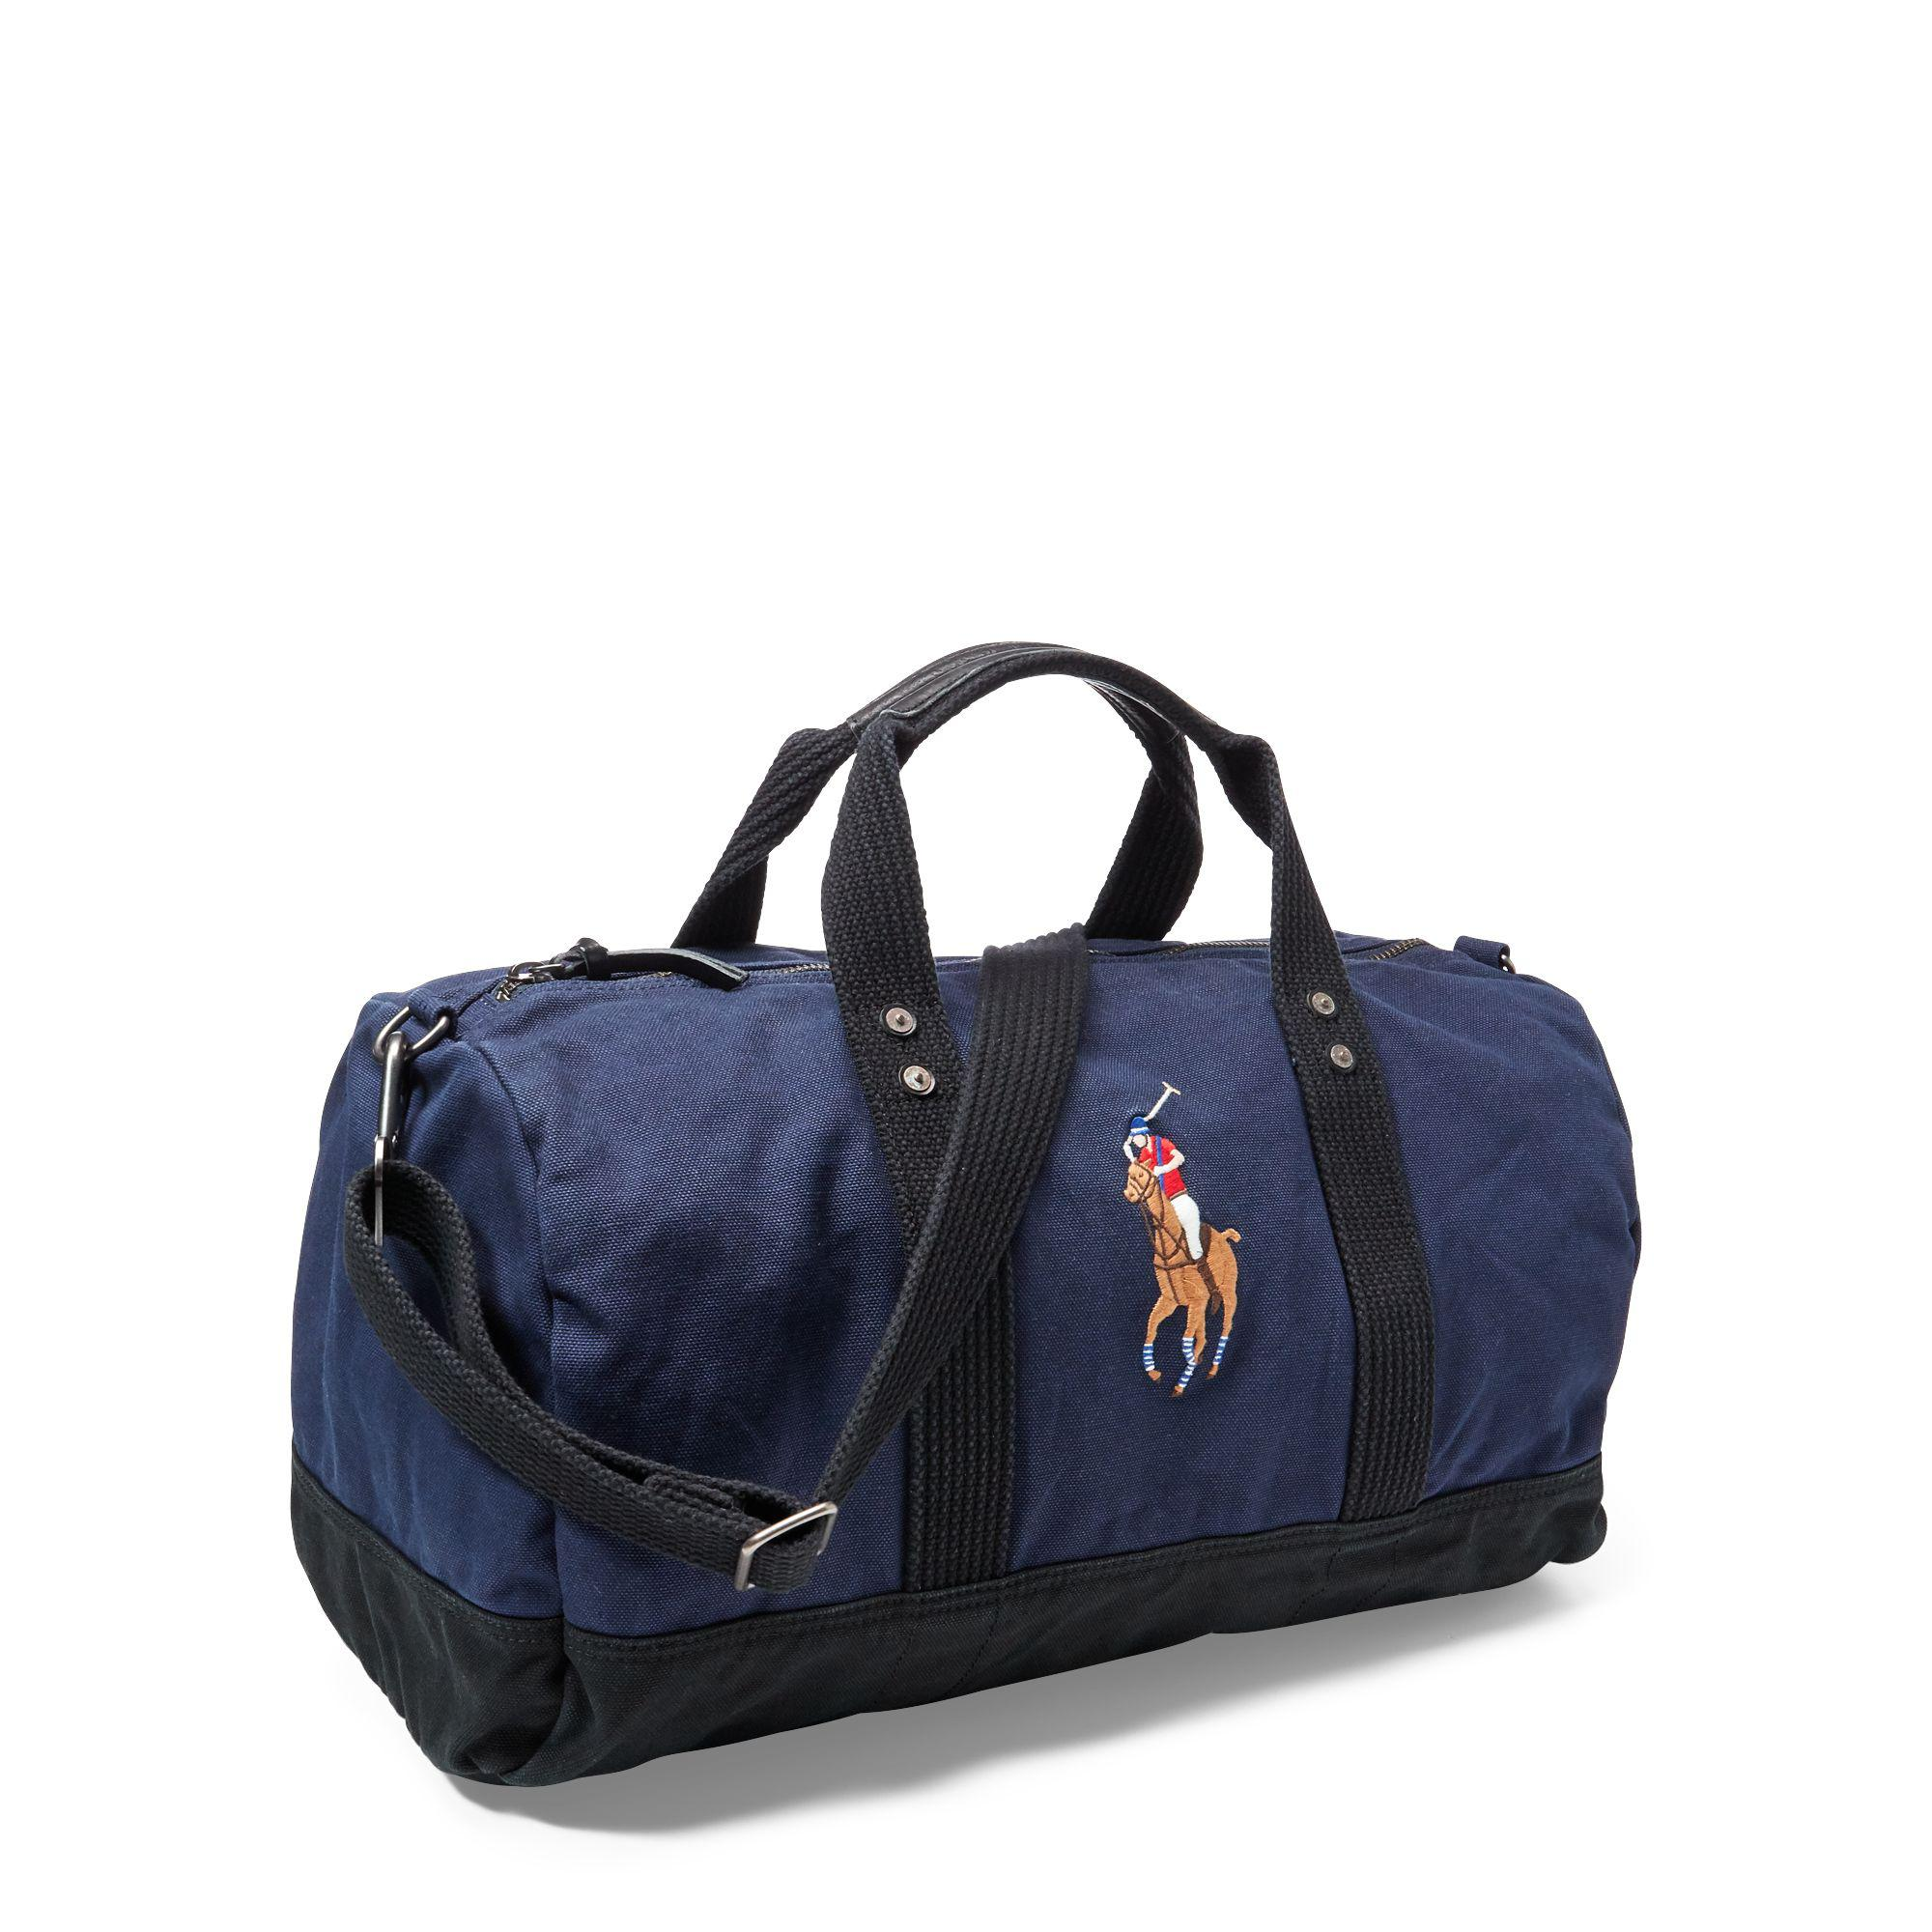 ... cheap lyst polo ralph lauren canvas big pony duffel bag in blue for men  471aa 0c88c 5078d59af00e0